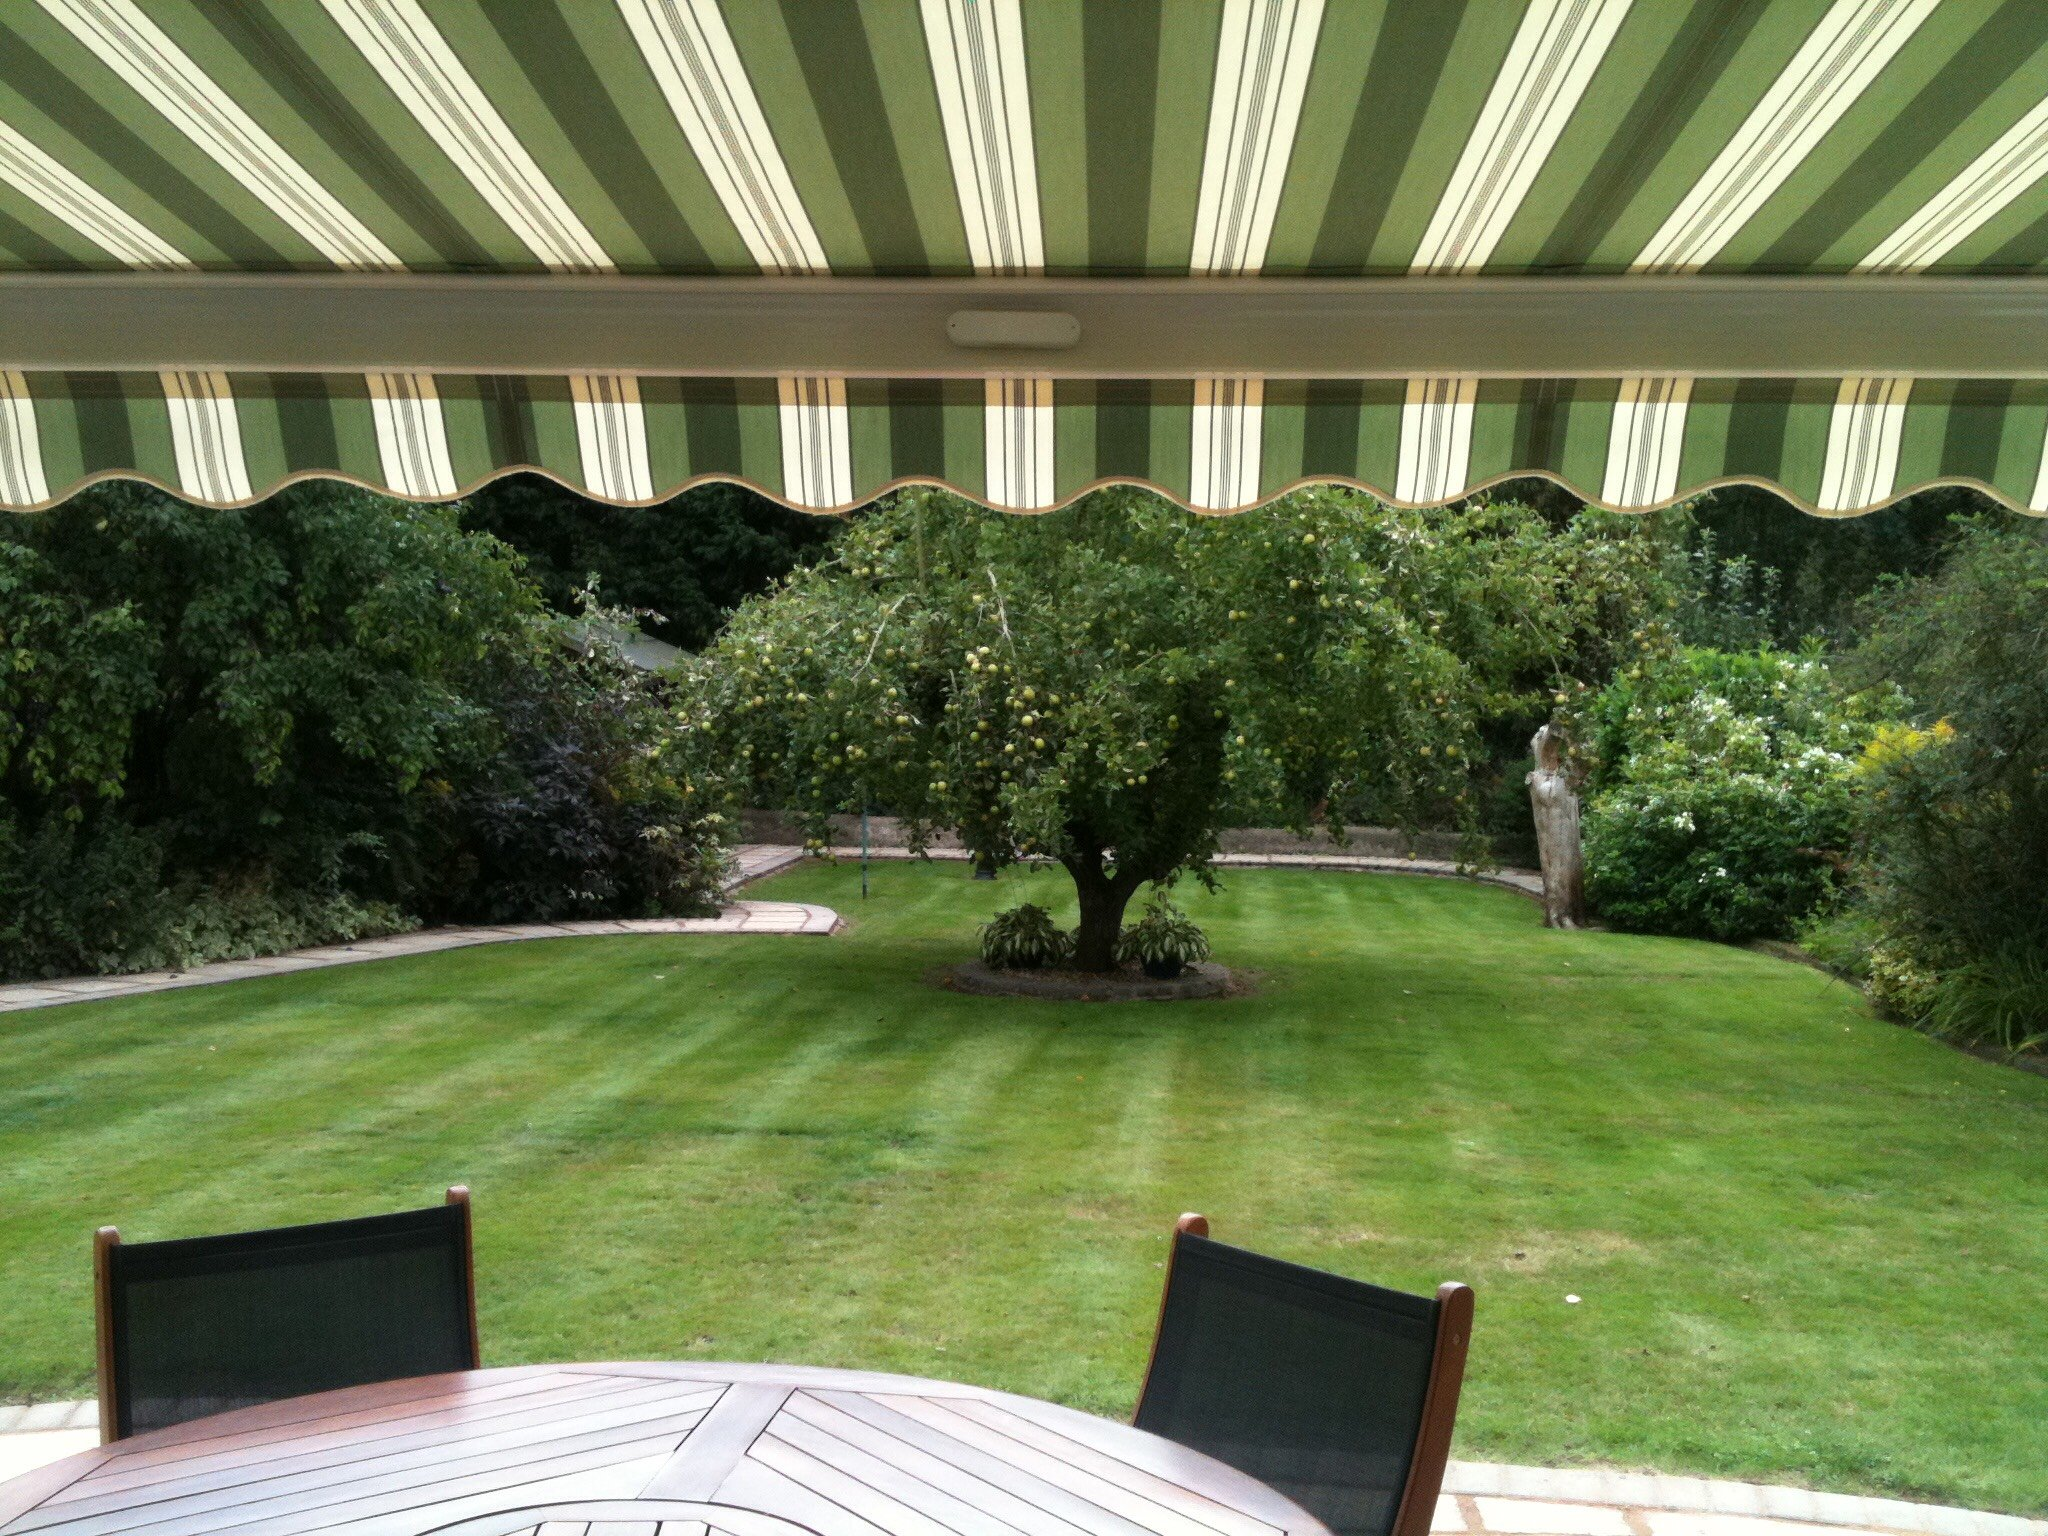 awning overlooking garden